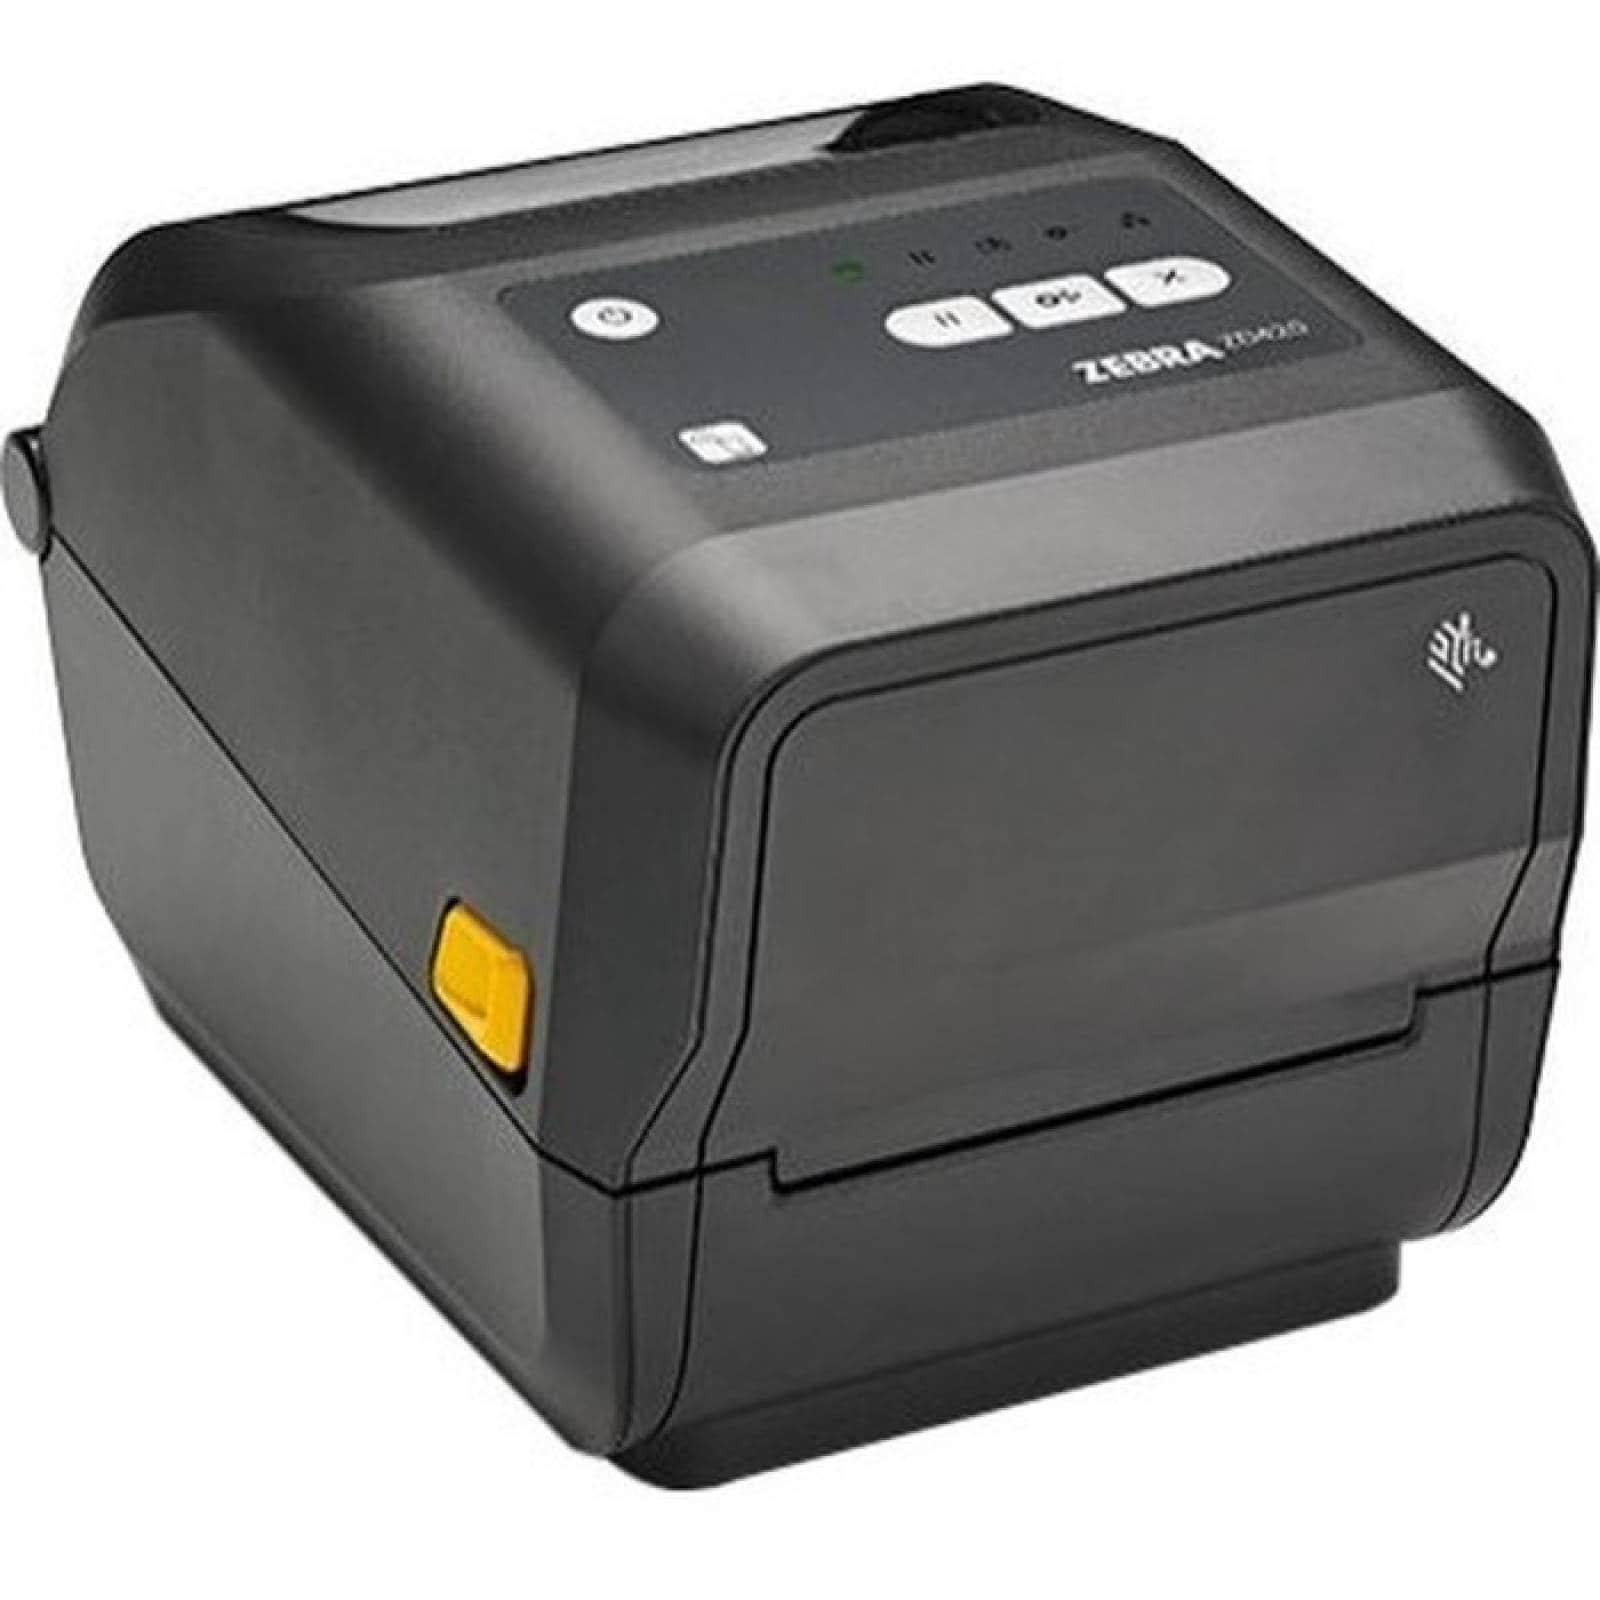 Impresora de transferencia trmica zebra zd420 monocromo